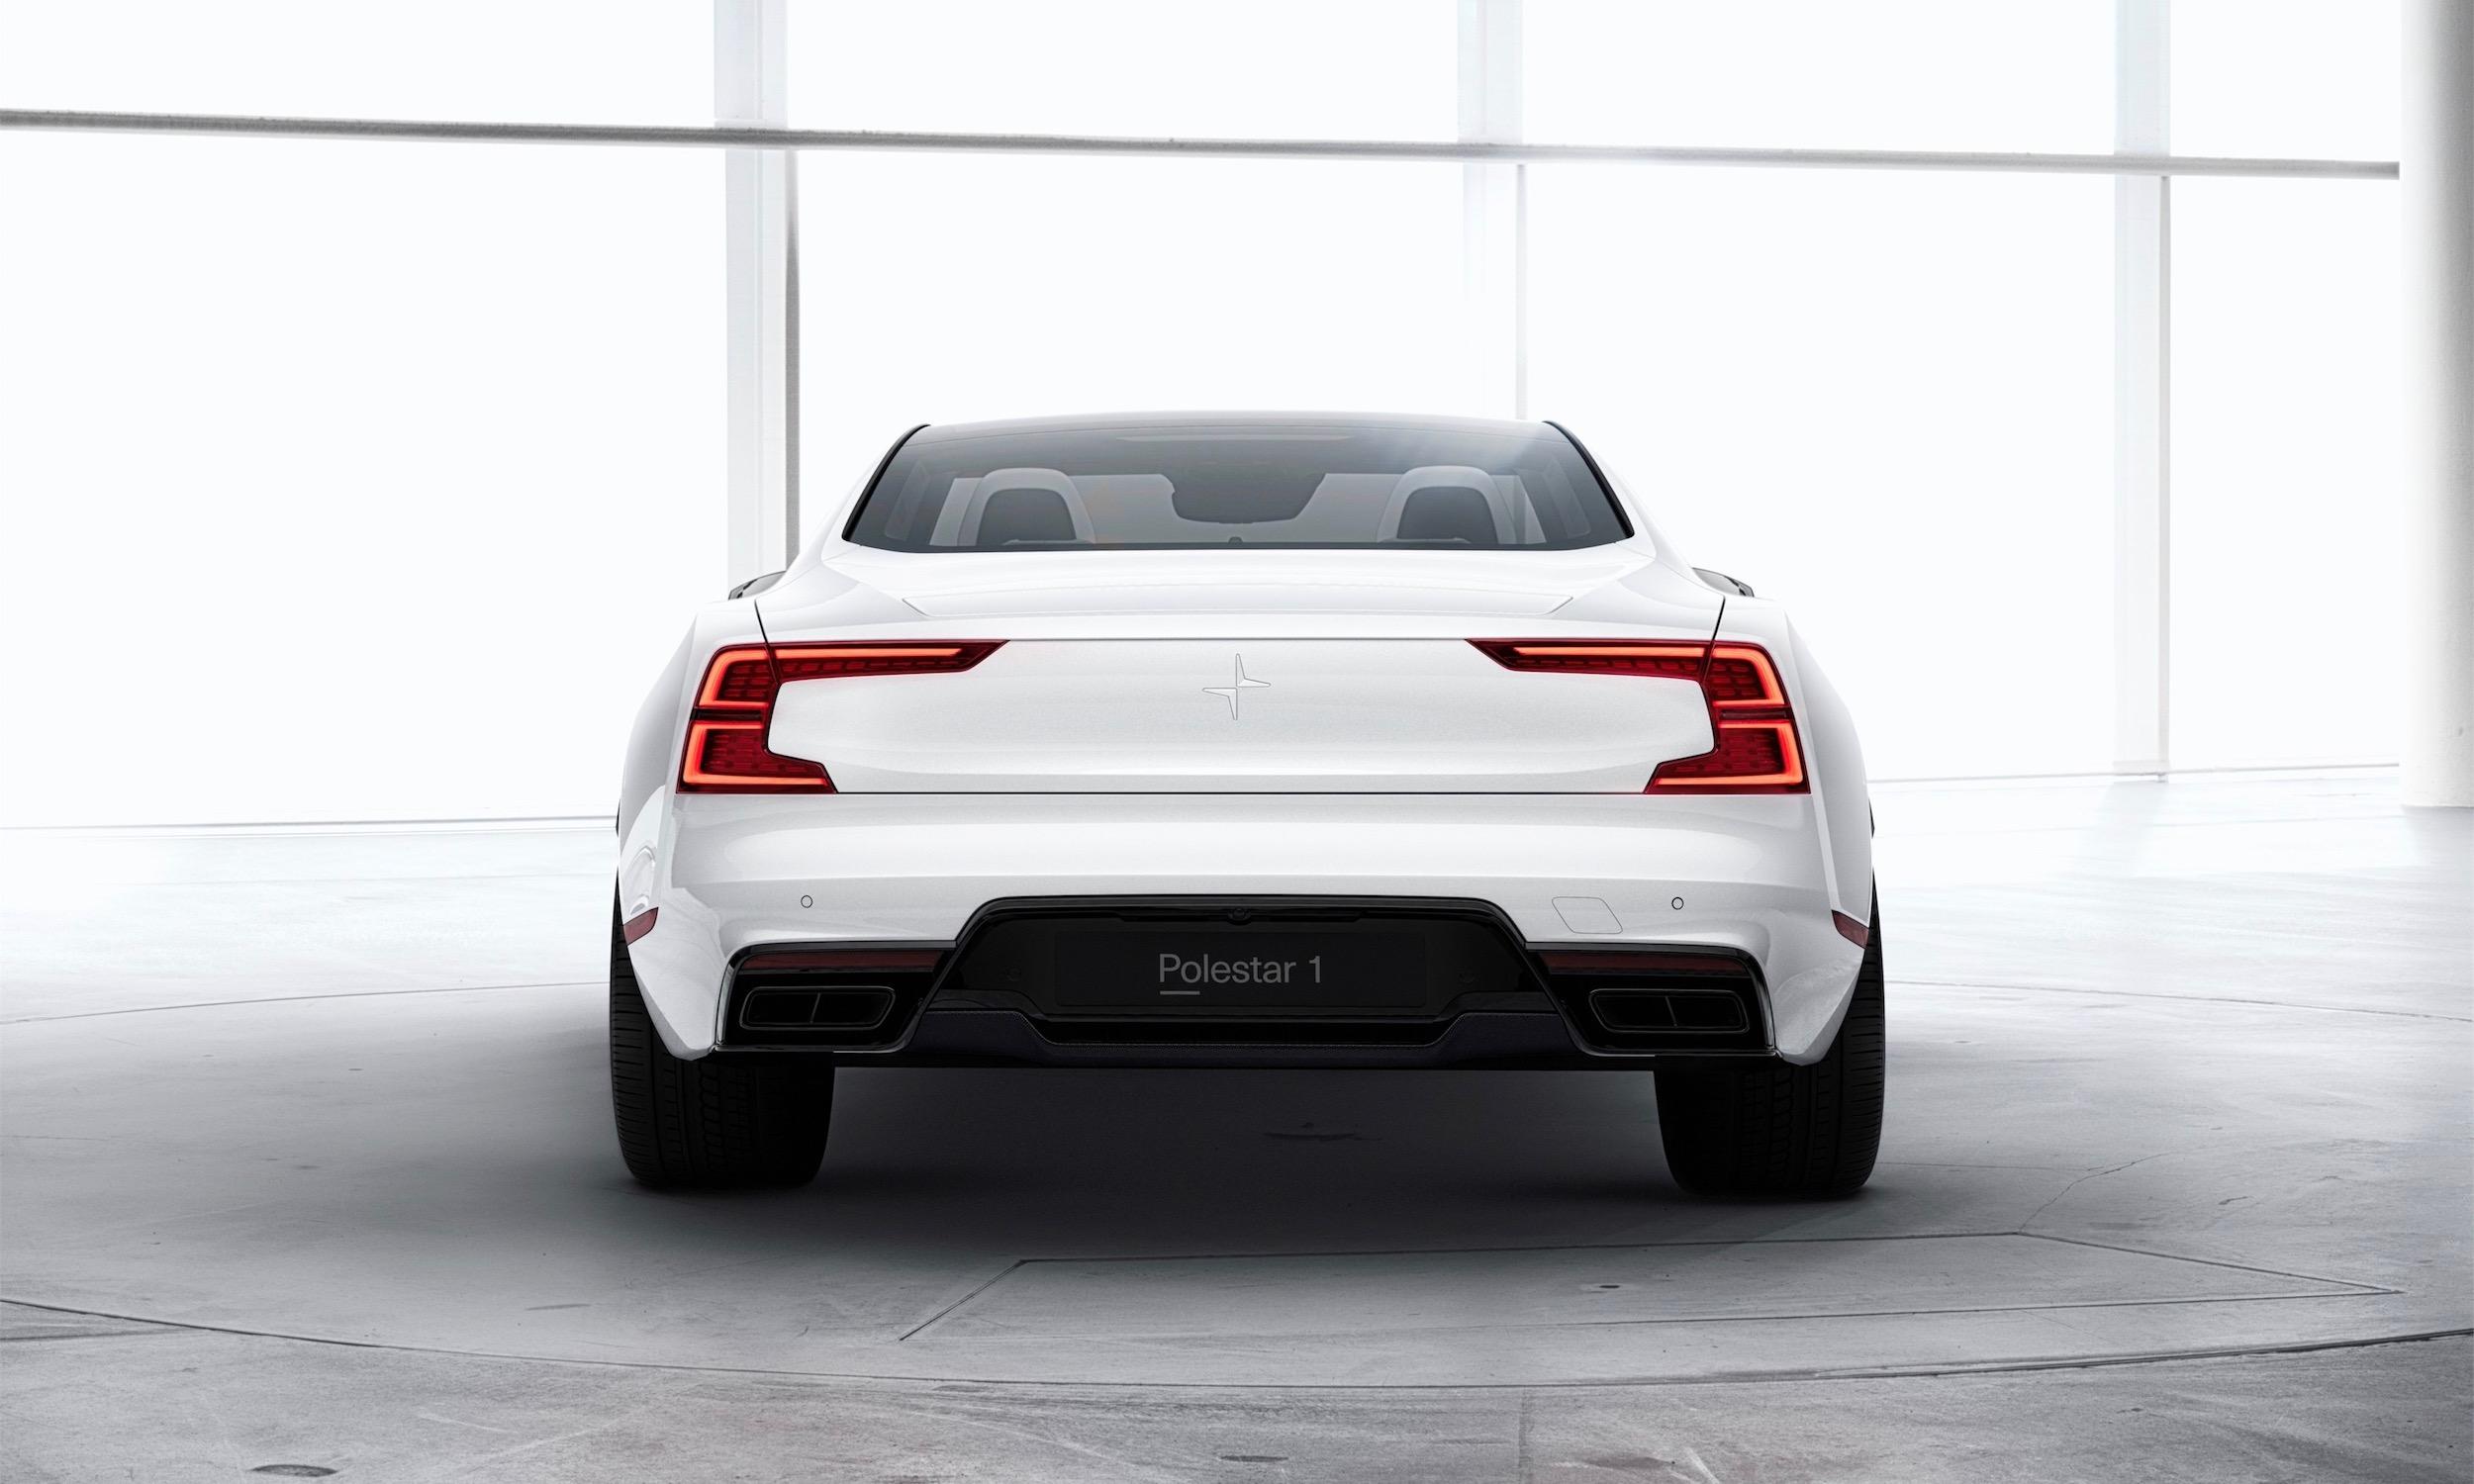 Polestar 1 white exterior, rear